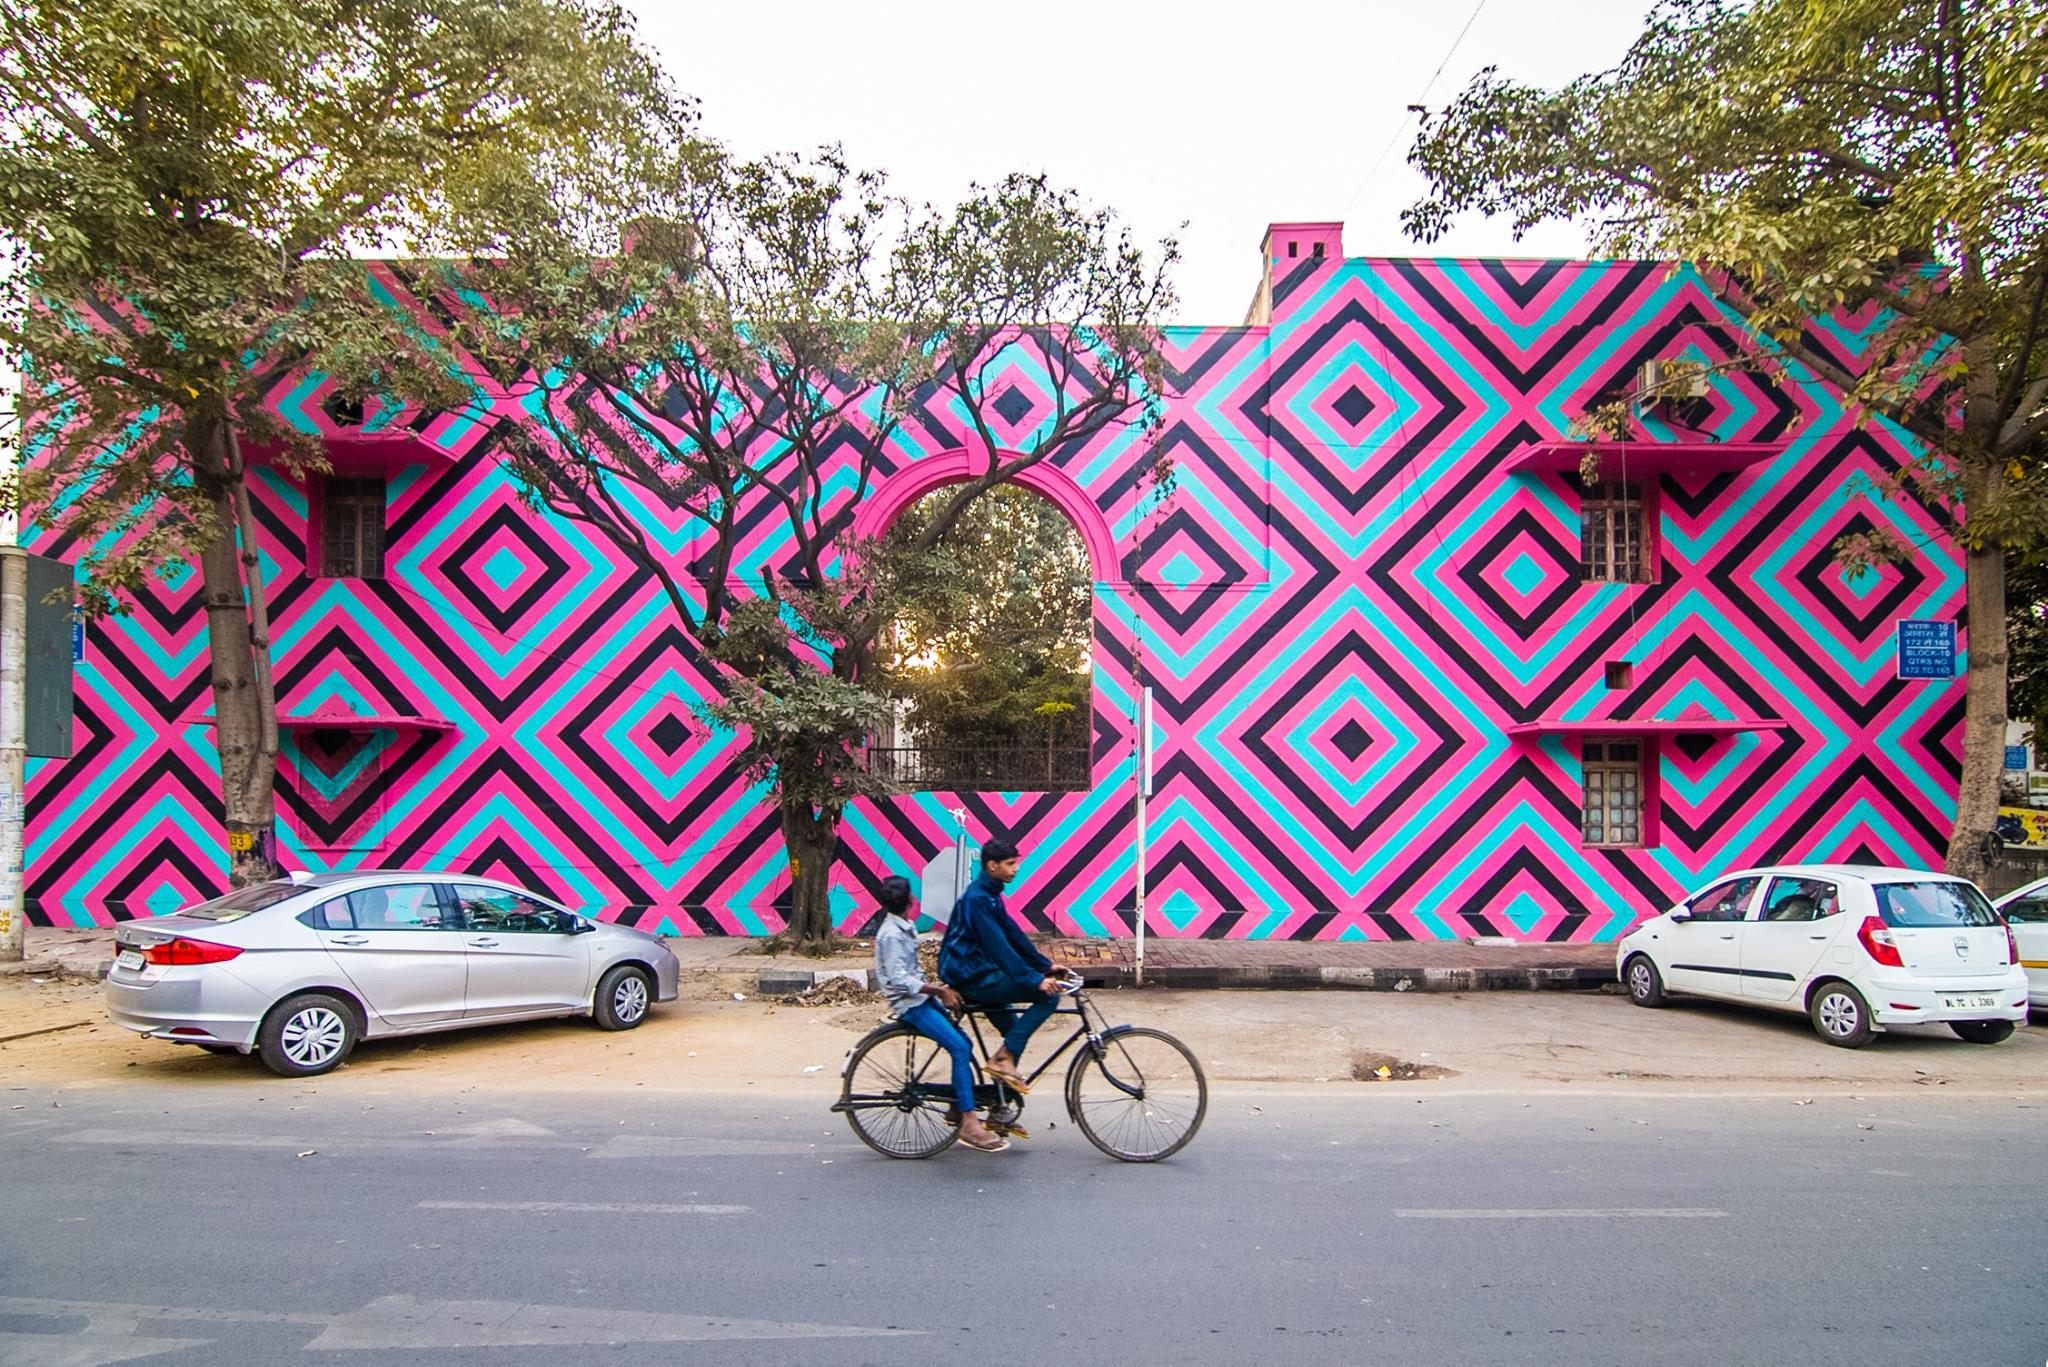 'Original Aboriginal' by Reko Rennie for St+Art Lodhi Art District, photo by Akshat Nauriyal